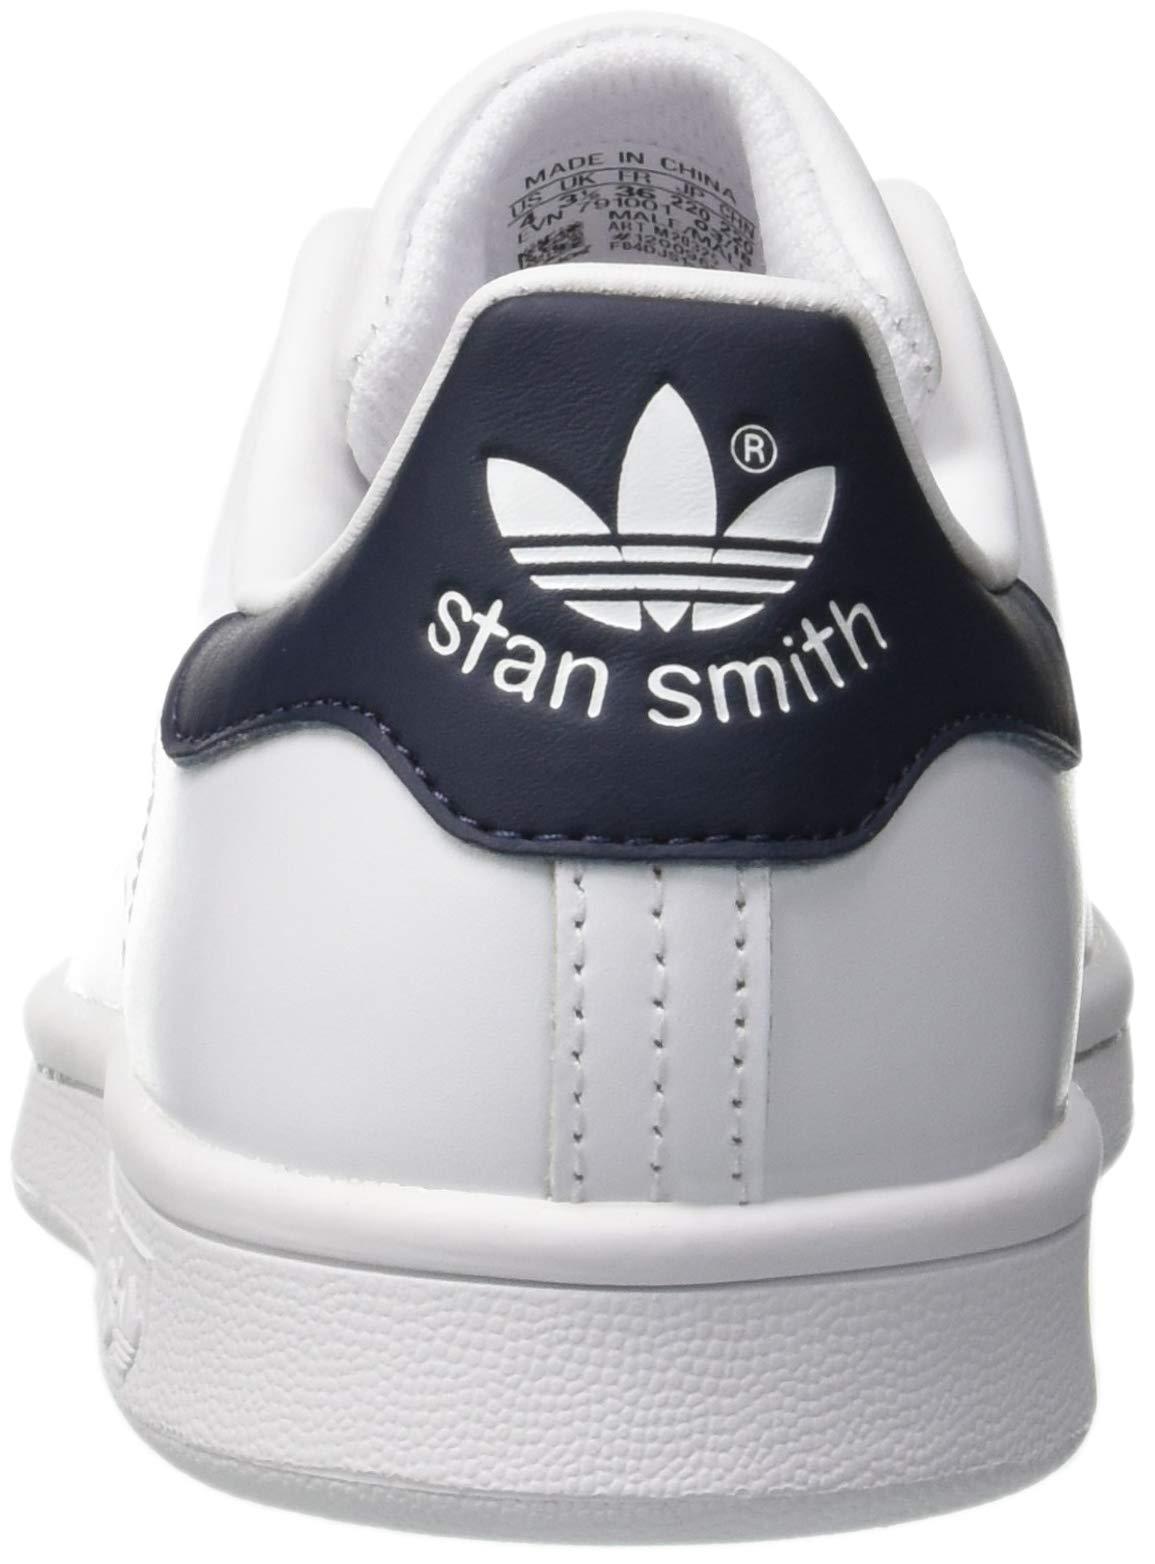 adidas Stan Smith, Scarpe da Tennis Unisex – Adulto 2 spesavip